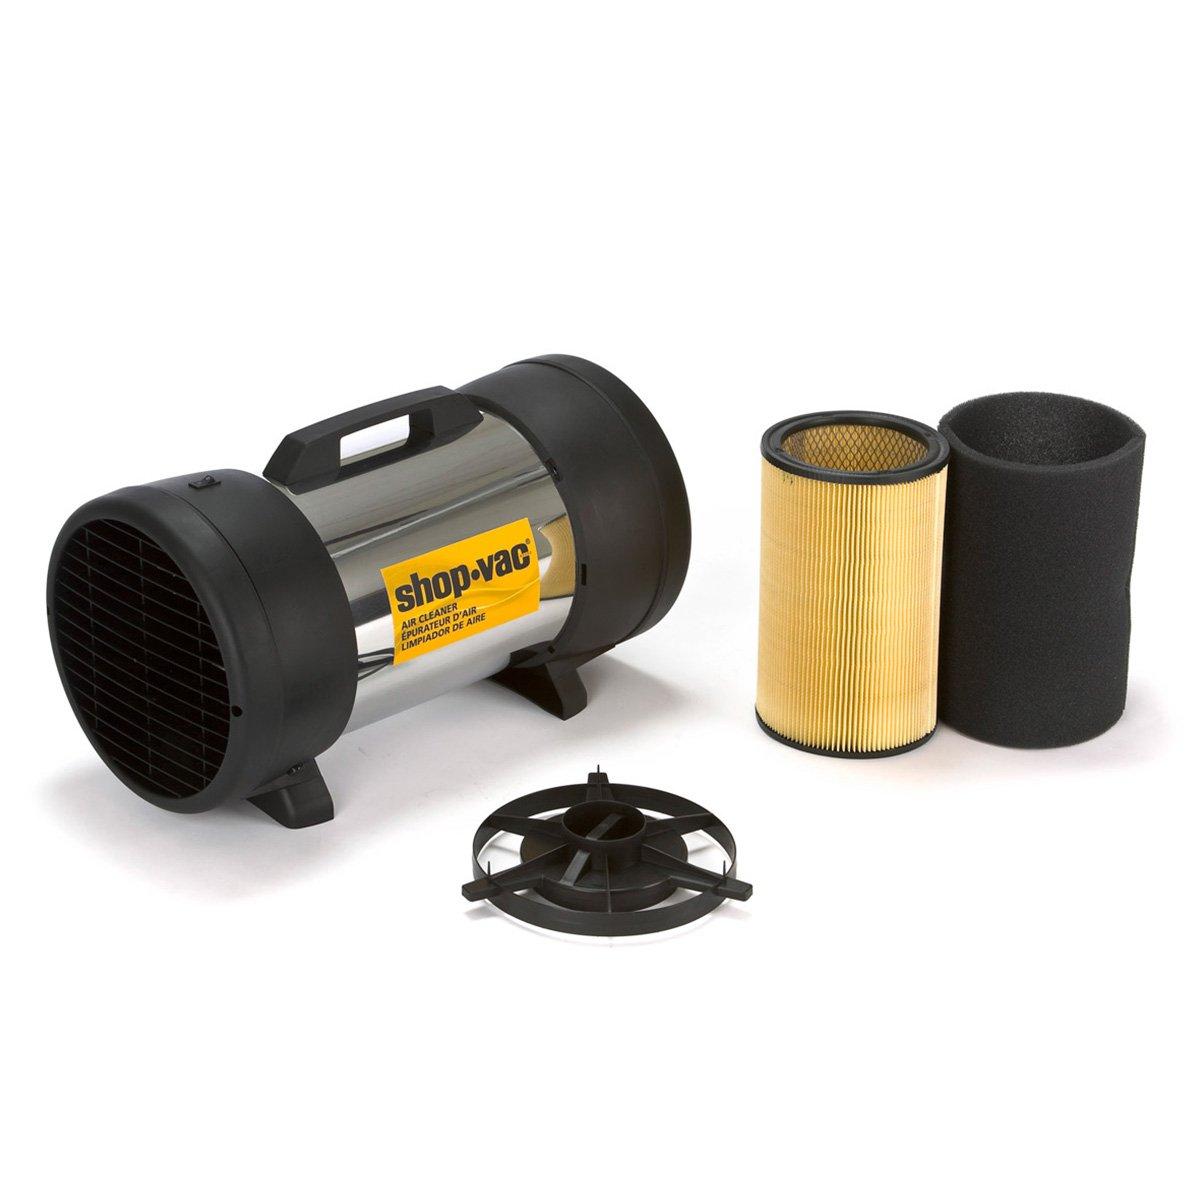 Shop-Vac 1030000 Air Cleaner Filtration System by Shop-Vac [並行輸入品] B00004T181